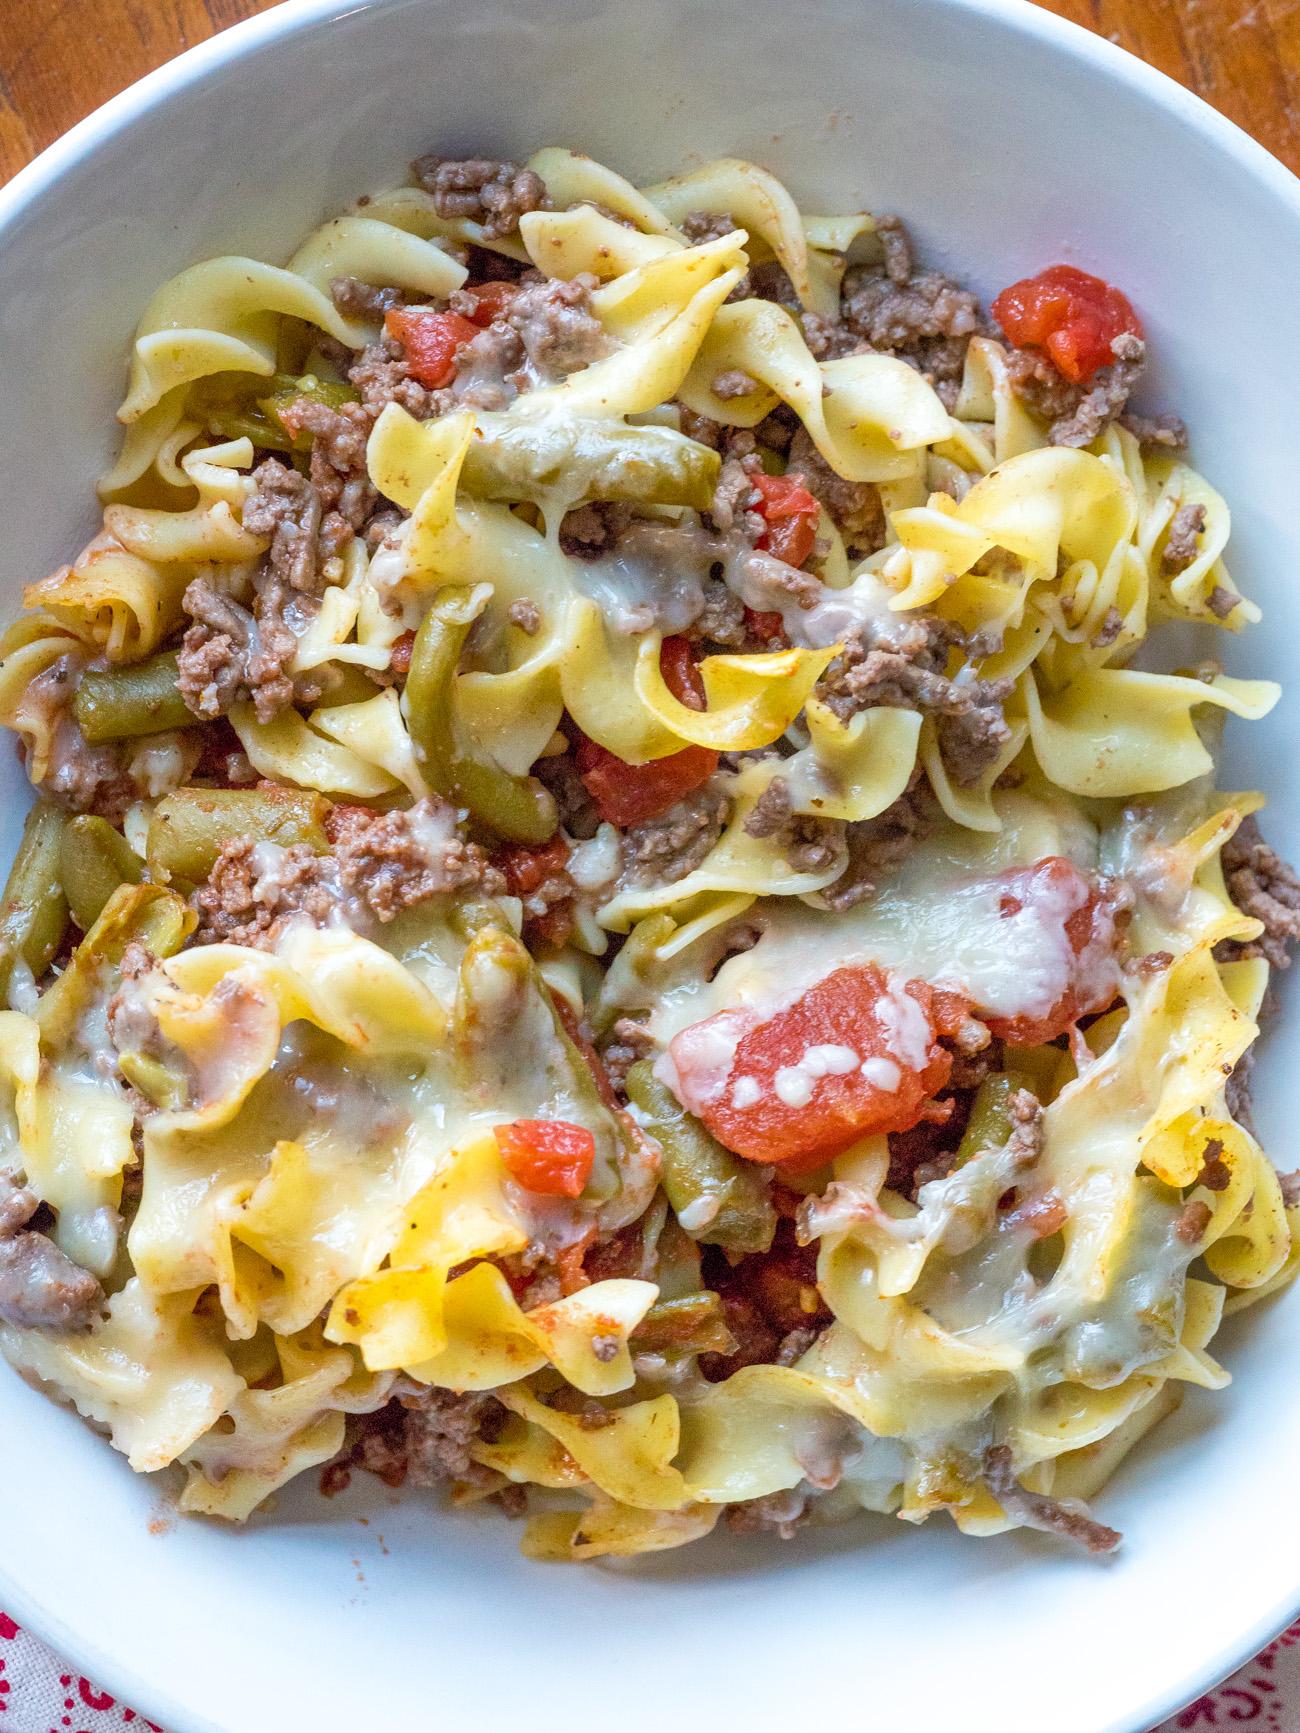 Beefy Egg Noodle Casserole